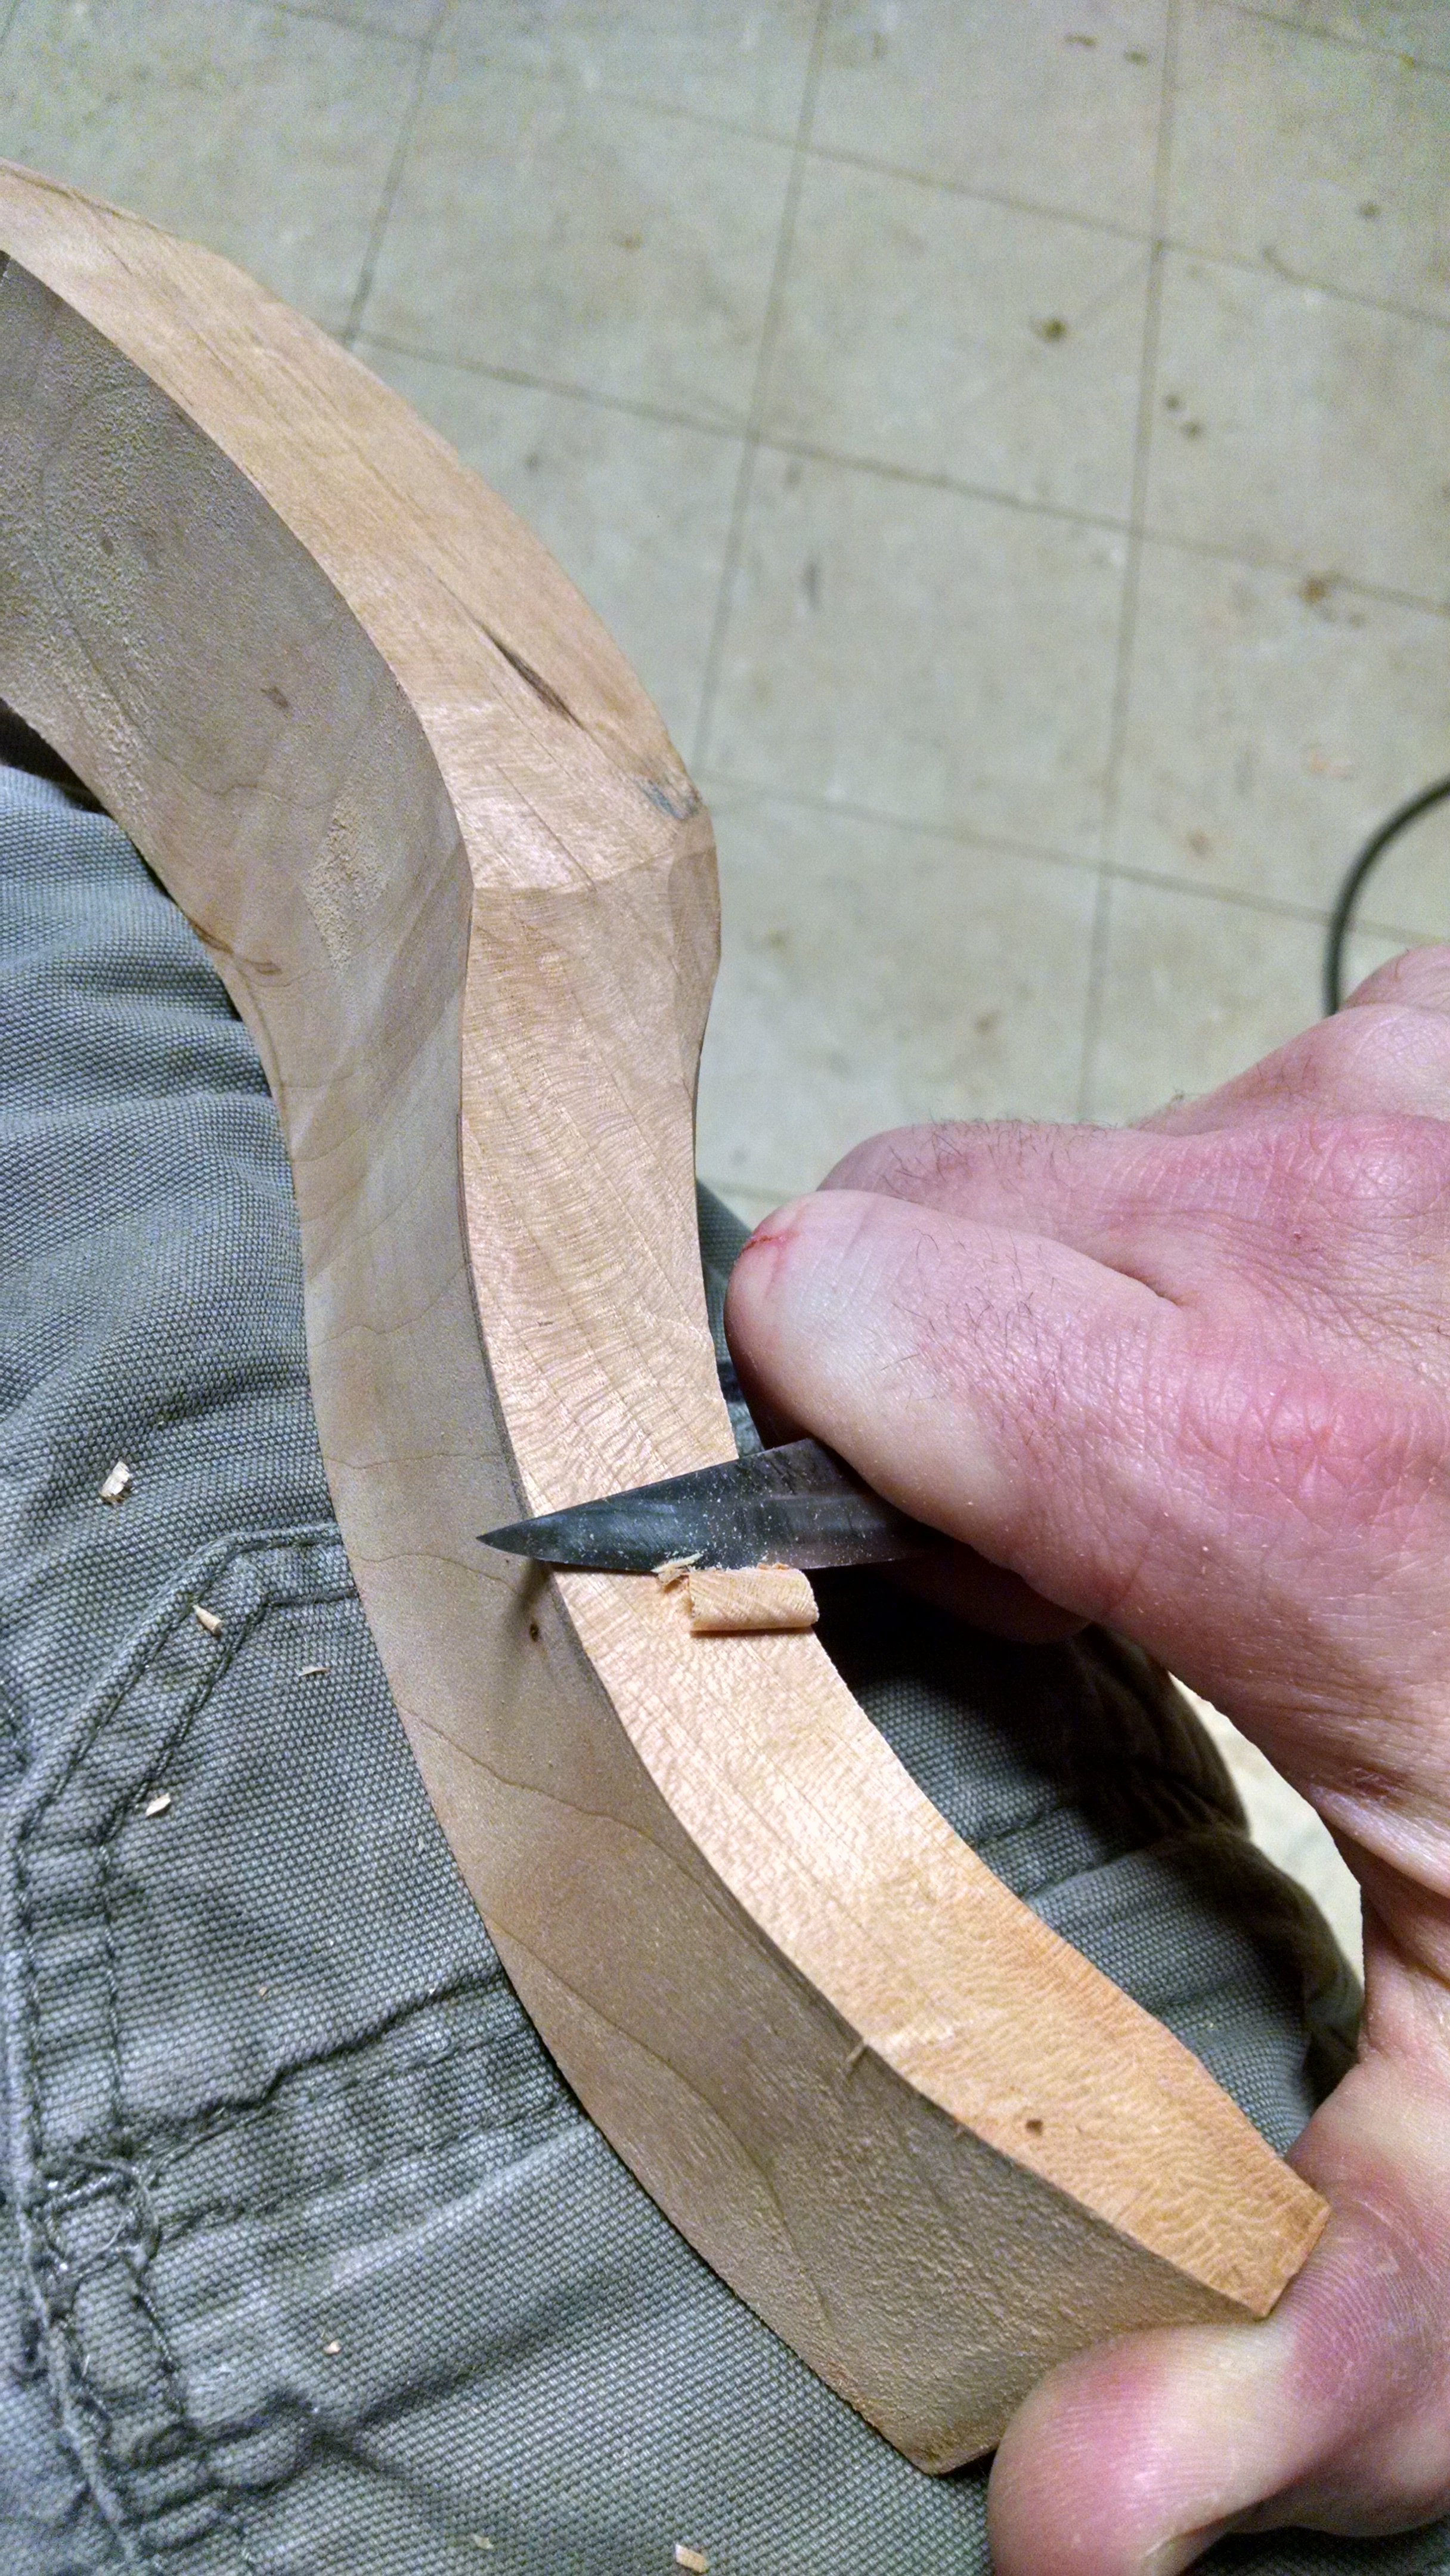 16-Travisher Handle Carving